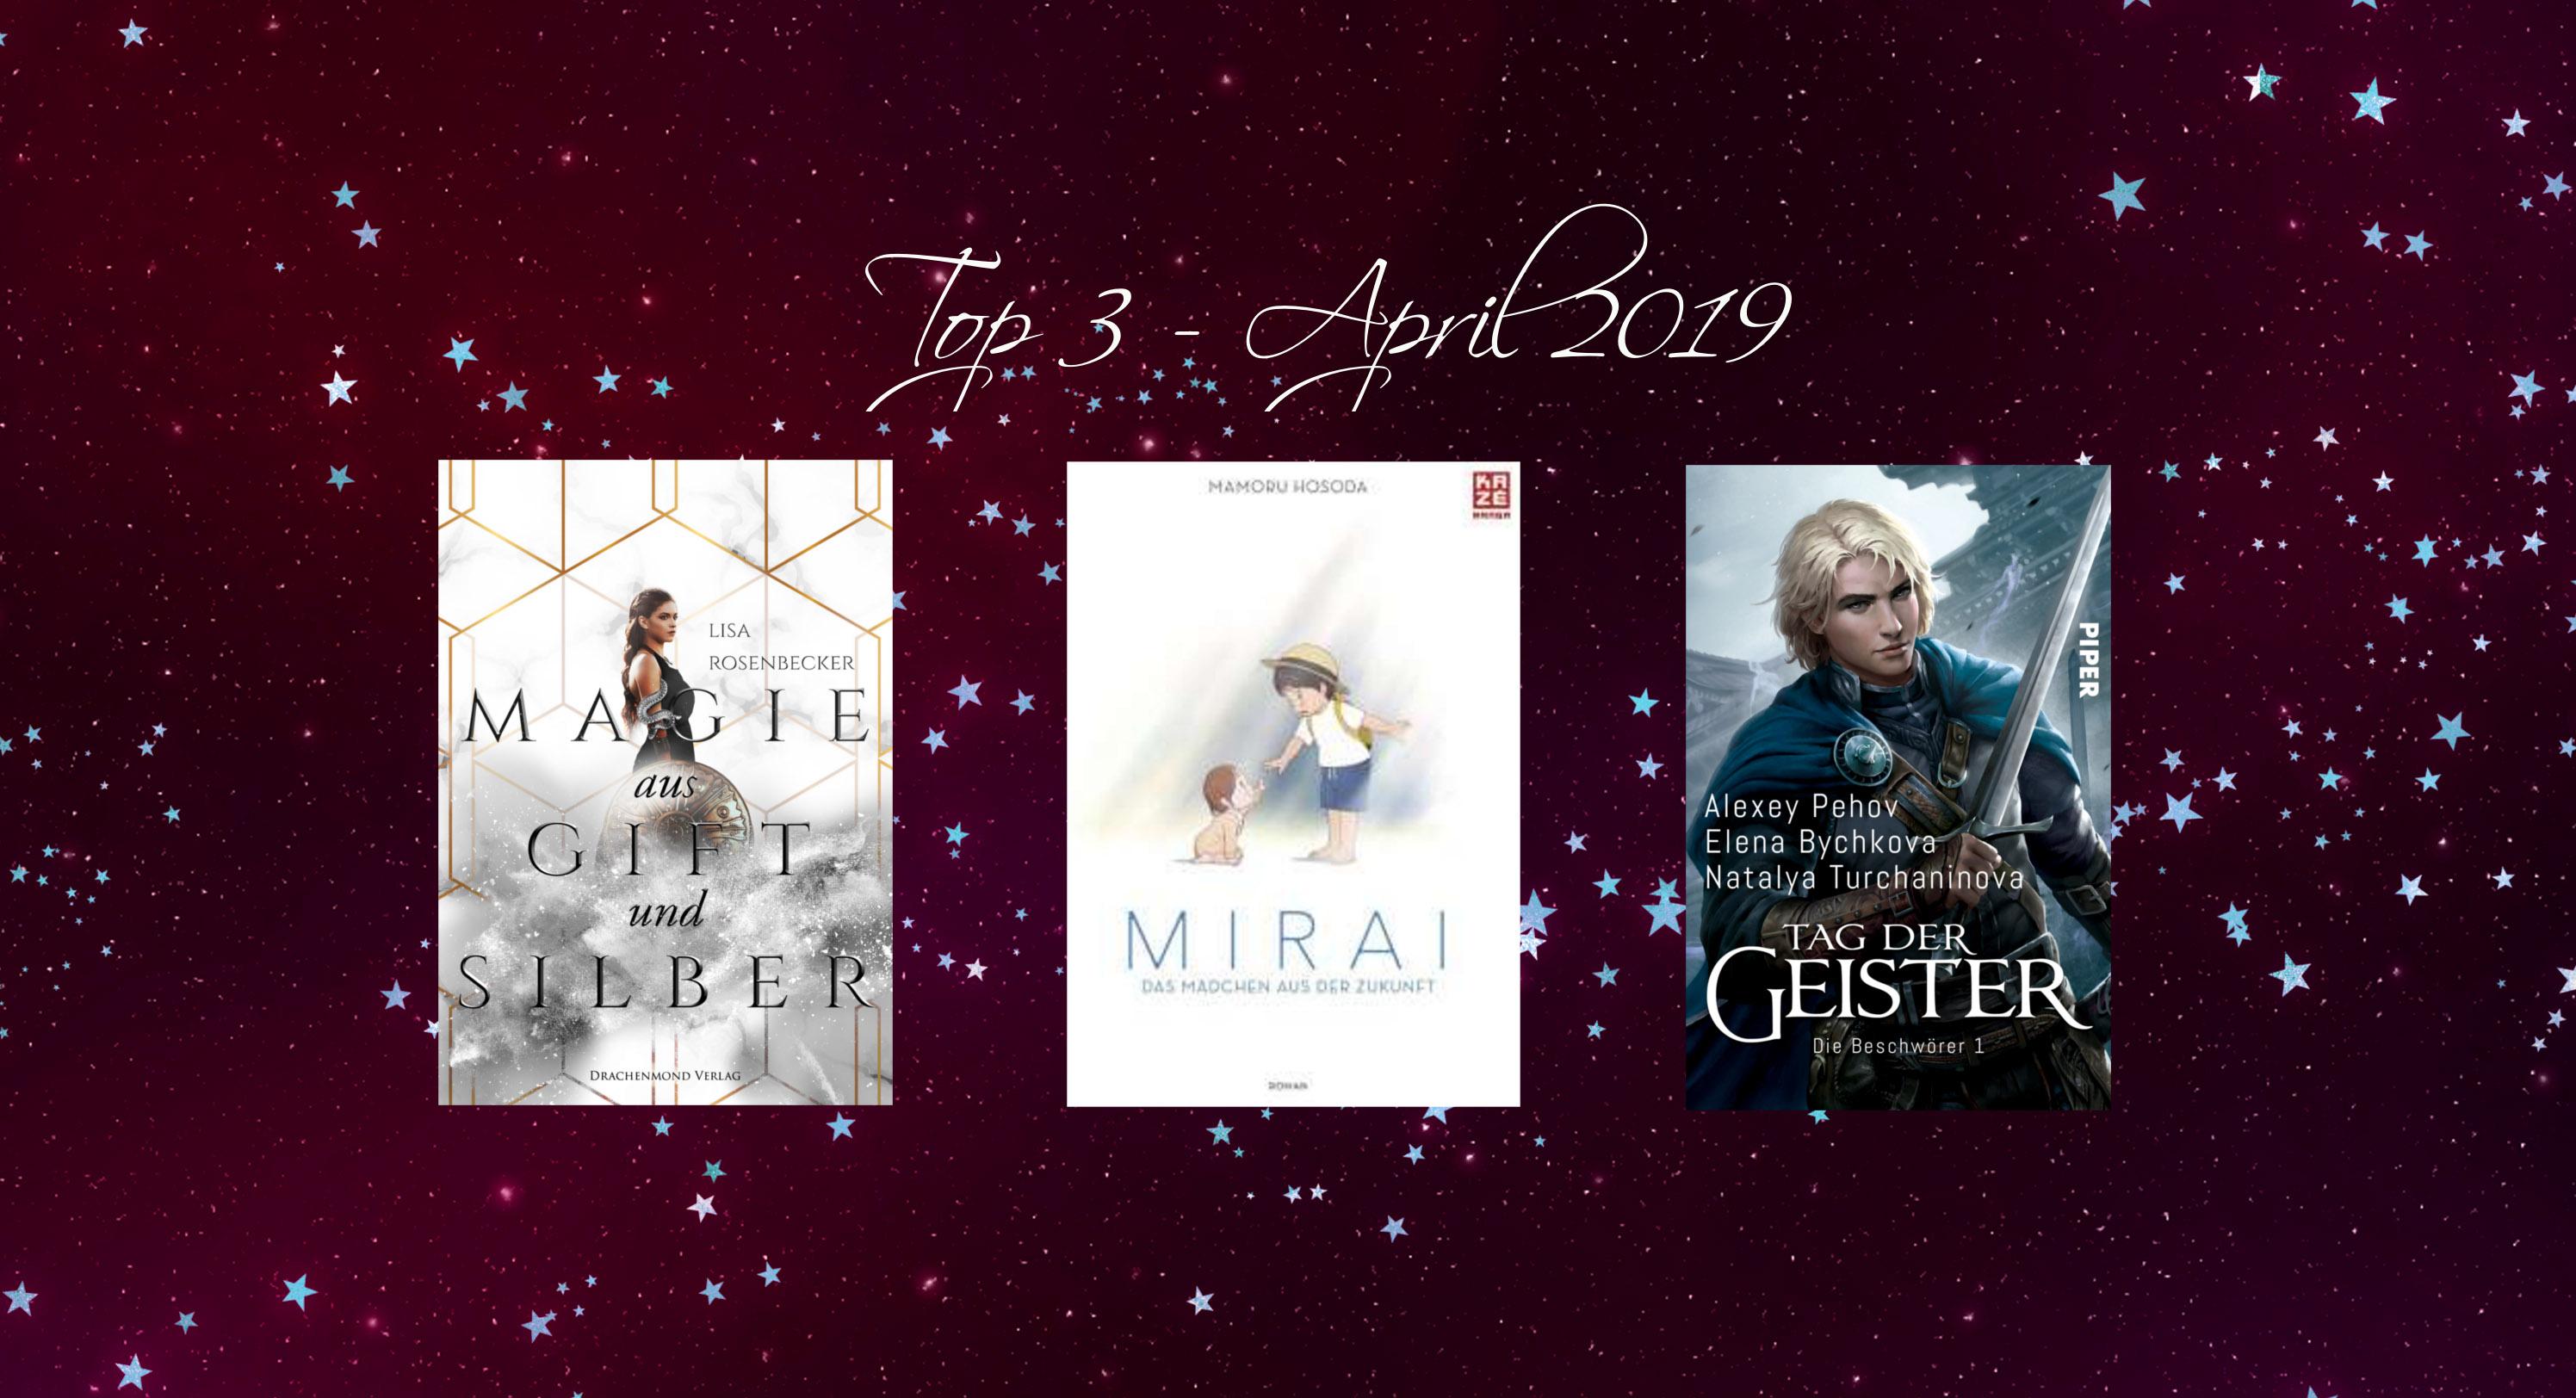 Top 3 Neuerscheinungen April 2019